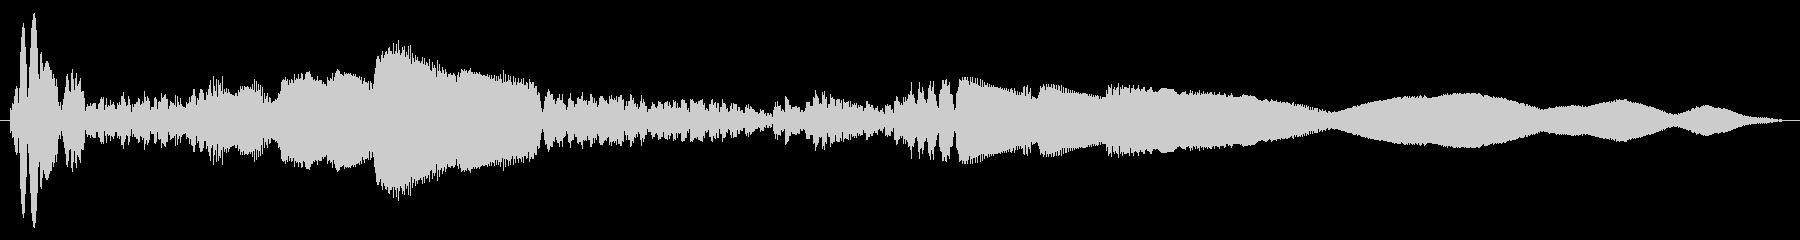 SciFi EC01_89_6の未再生の波形